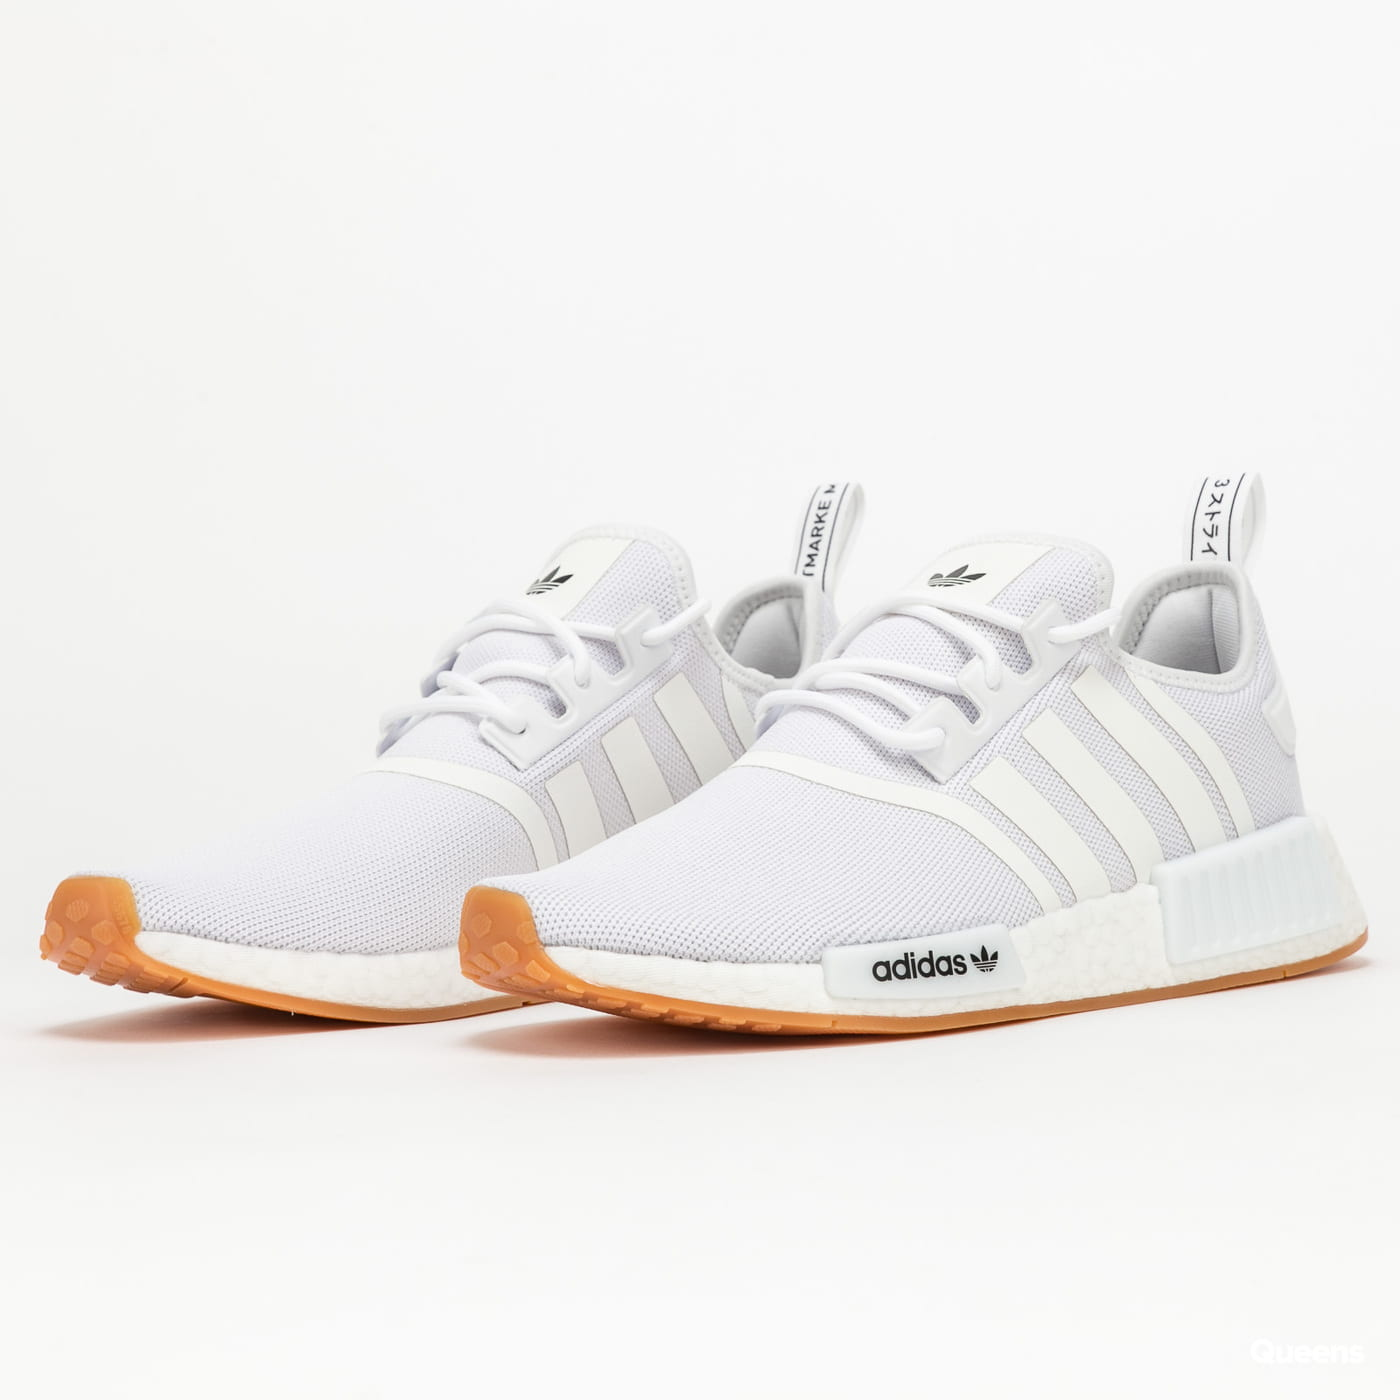 adidas Originals NMD_R1 Primeblue cwhite / cwhite / gum